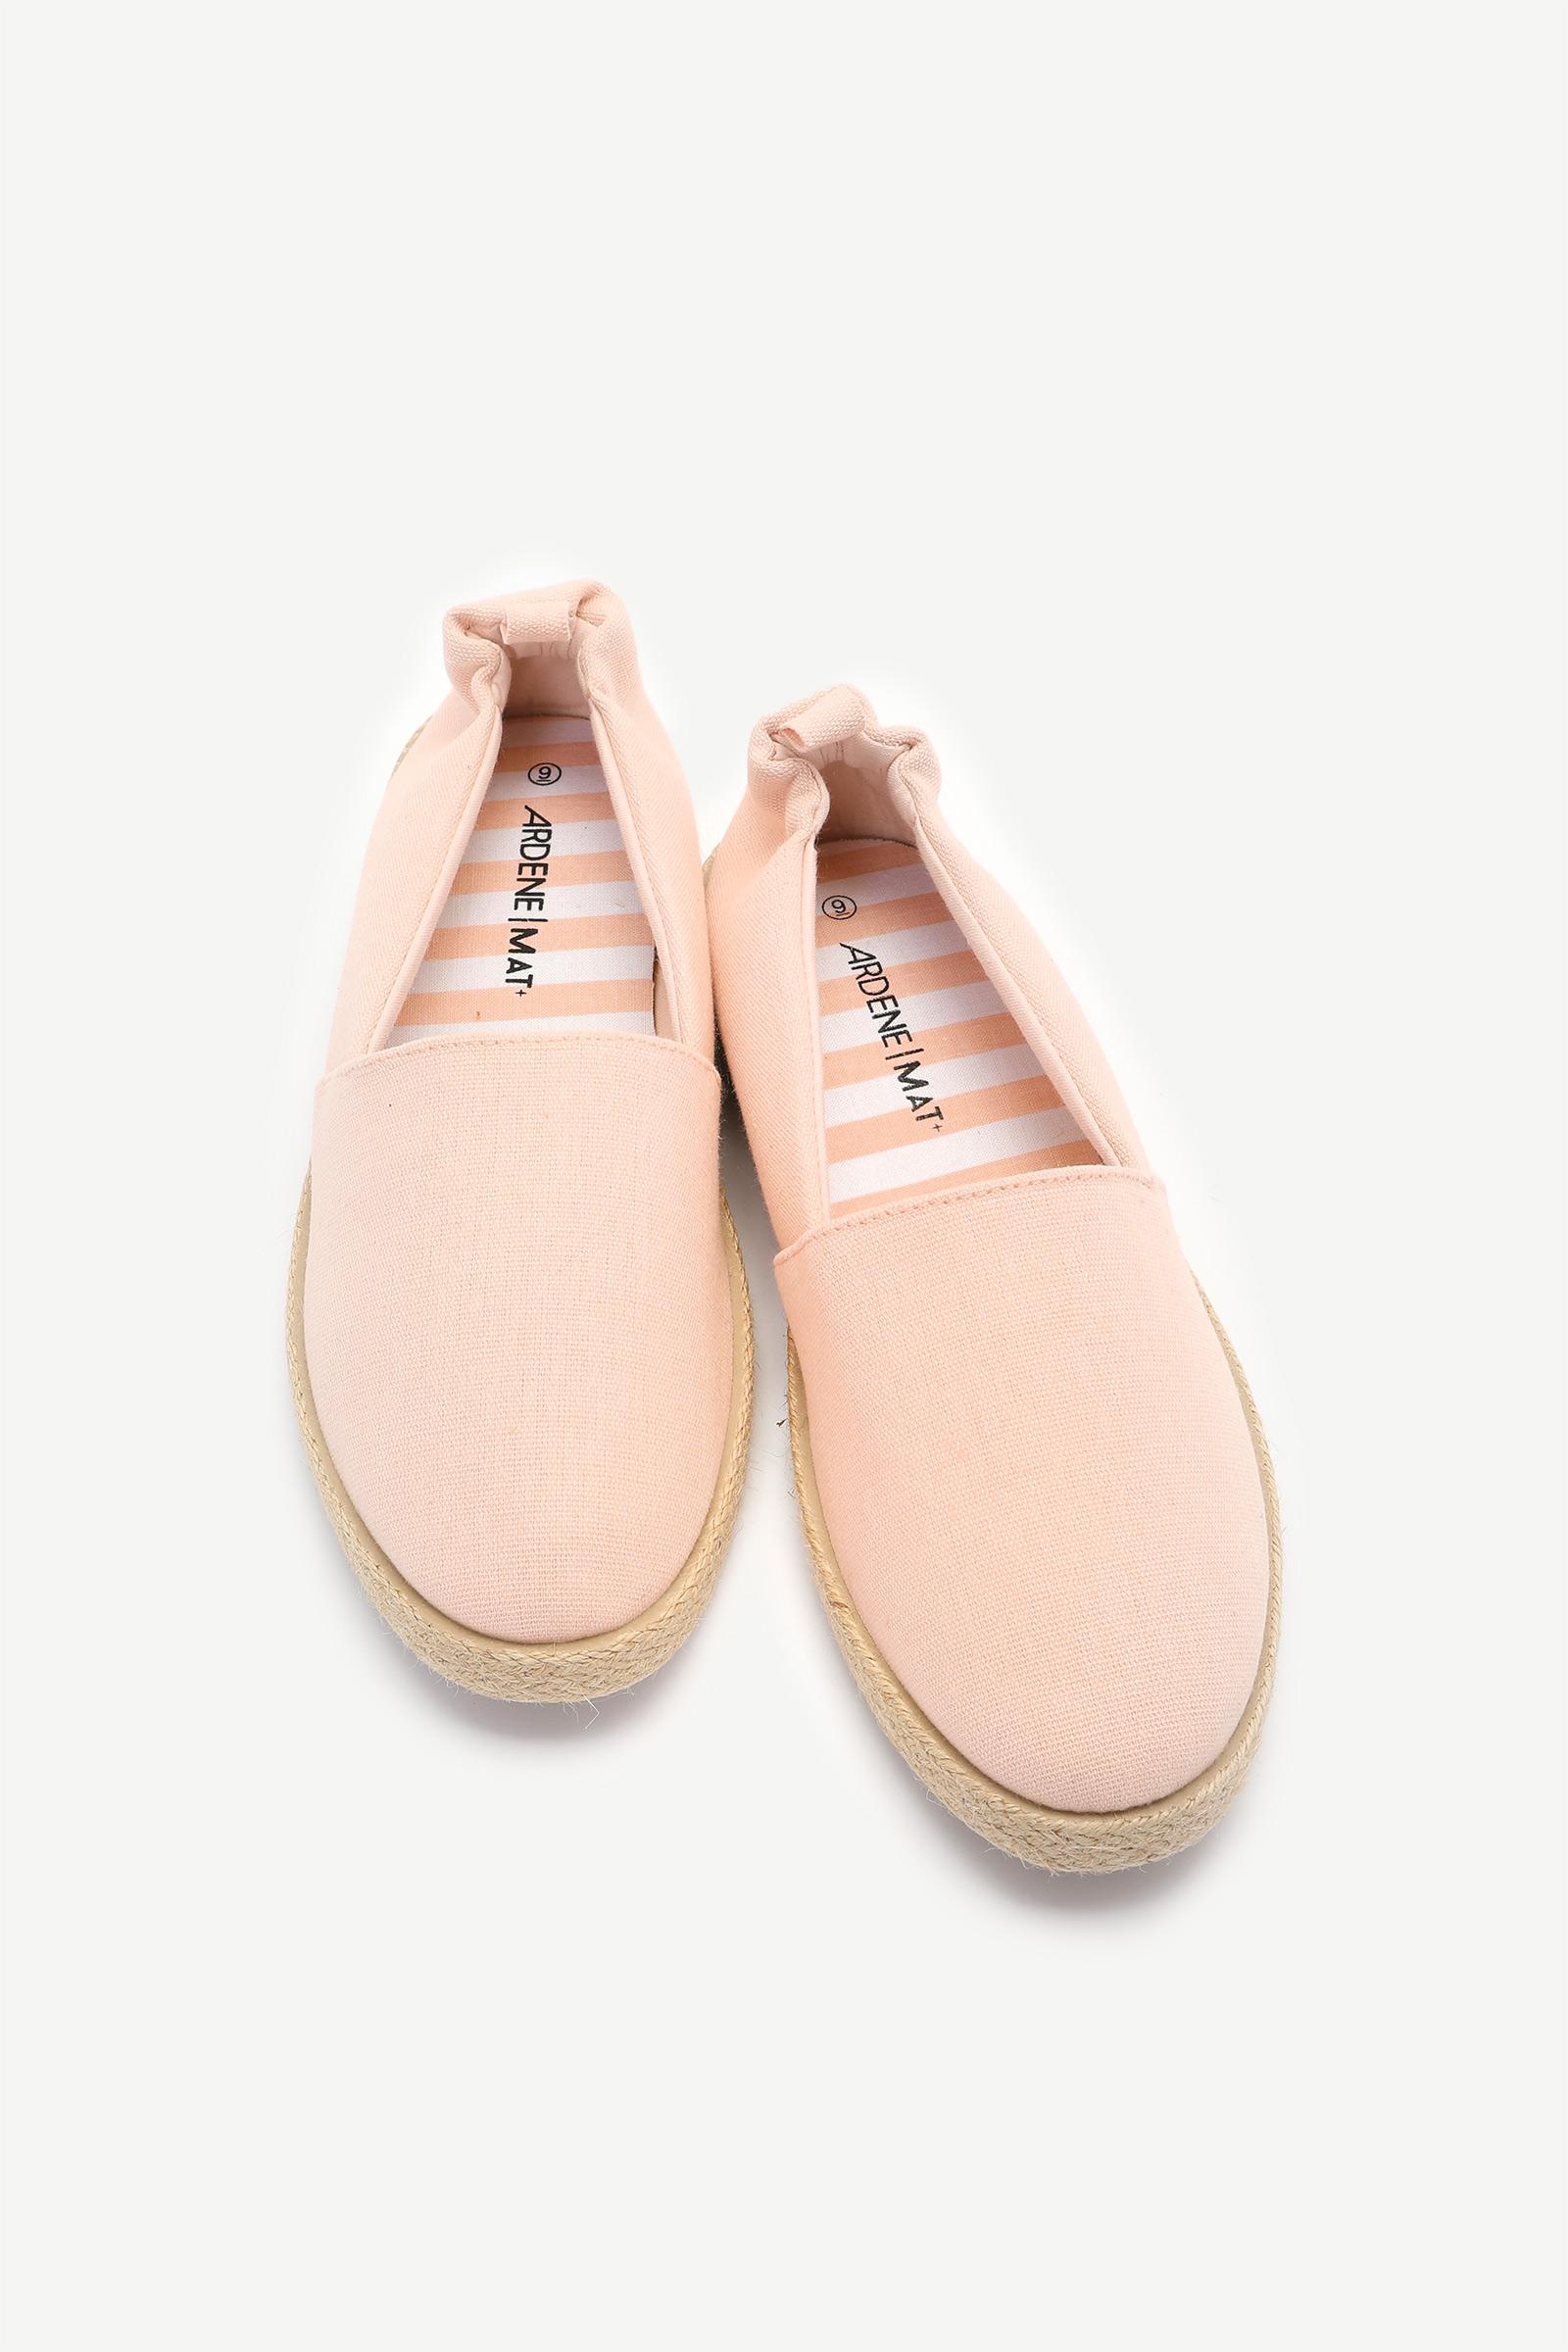 Jute Slip-On Shoes